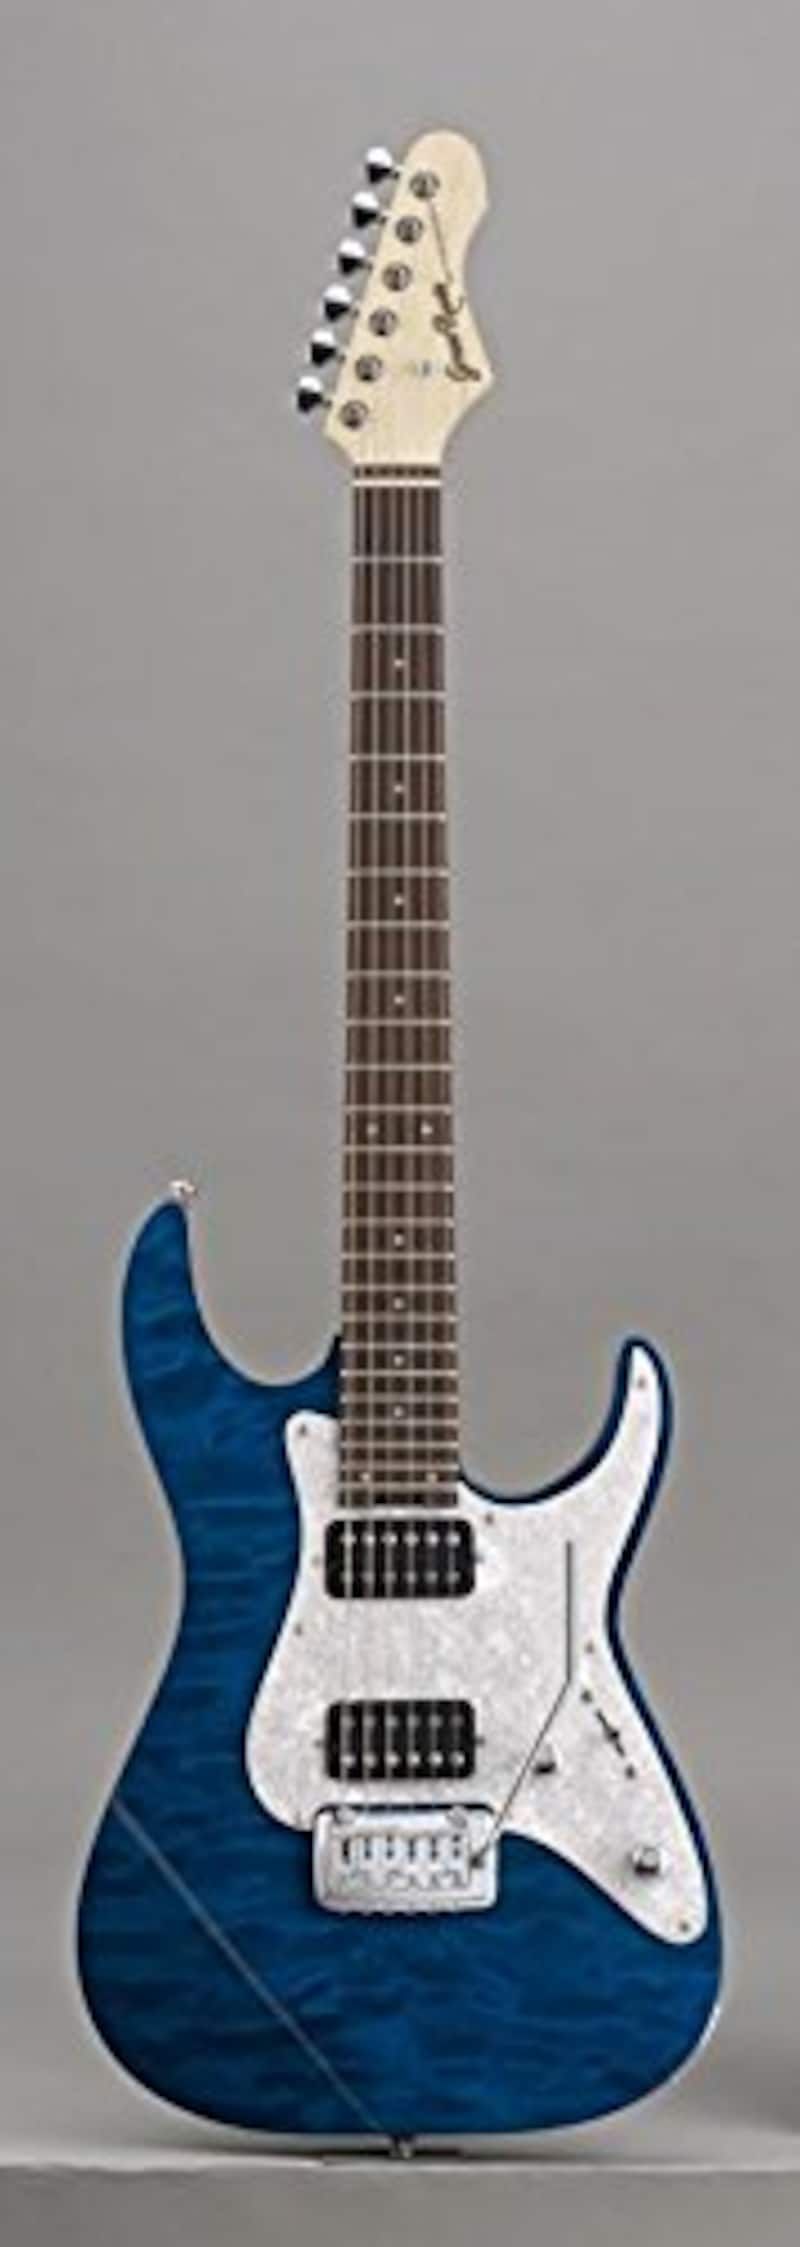 GrassRoots,エレキギター  G-MR-45R See Thru Blue